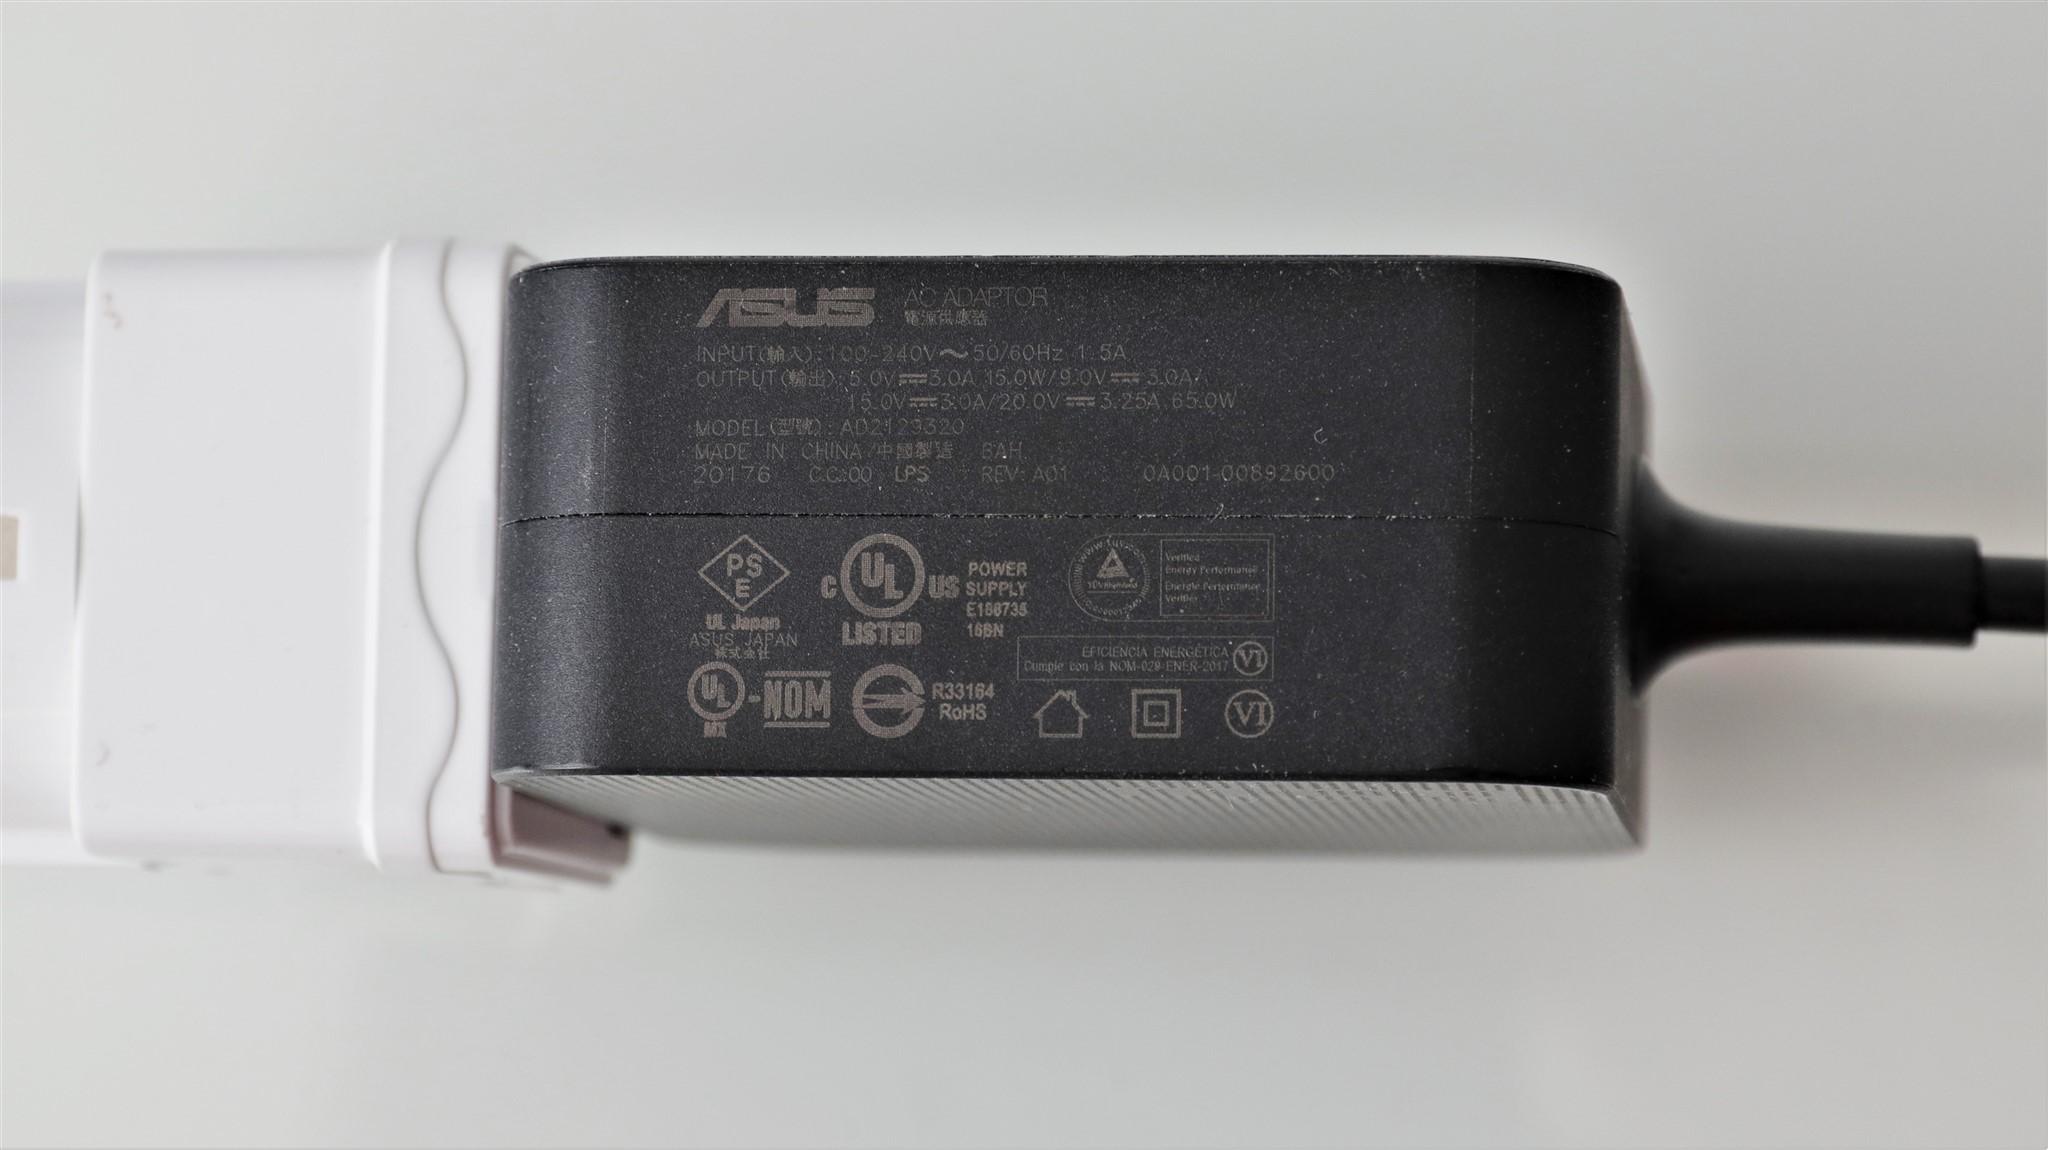 Incacrcator Asus ZenBook 13 UX325JA